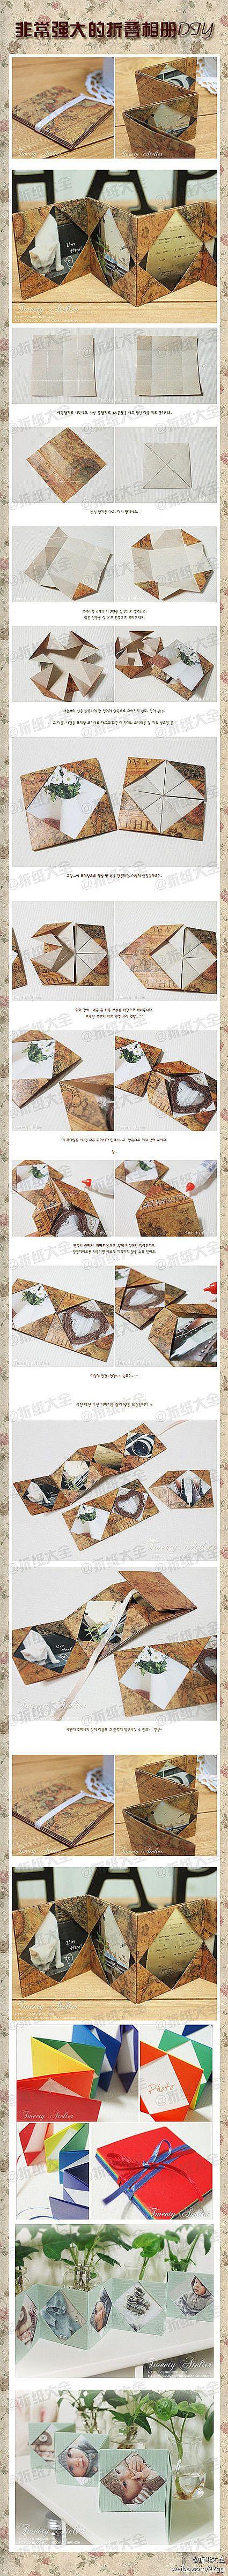 103 Best Origami Images On Pinterest Papercraft Creative Ideas Koi Diagram Book Diy Retro Feel Of The Full Folding Album Original Addressdiy Photo Frames